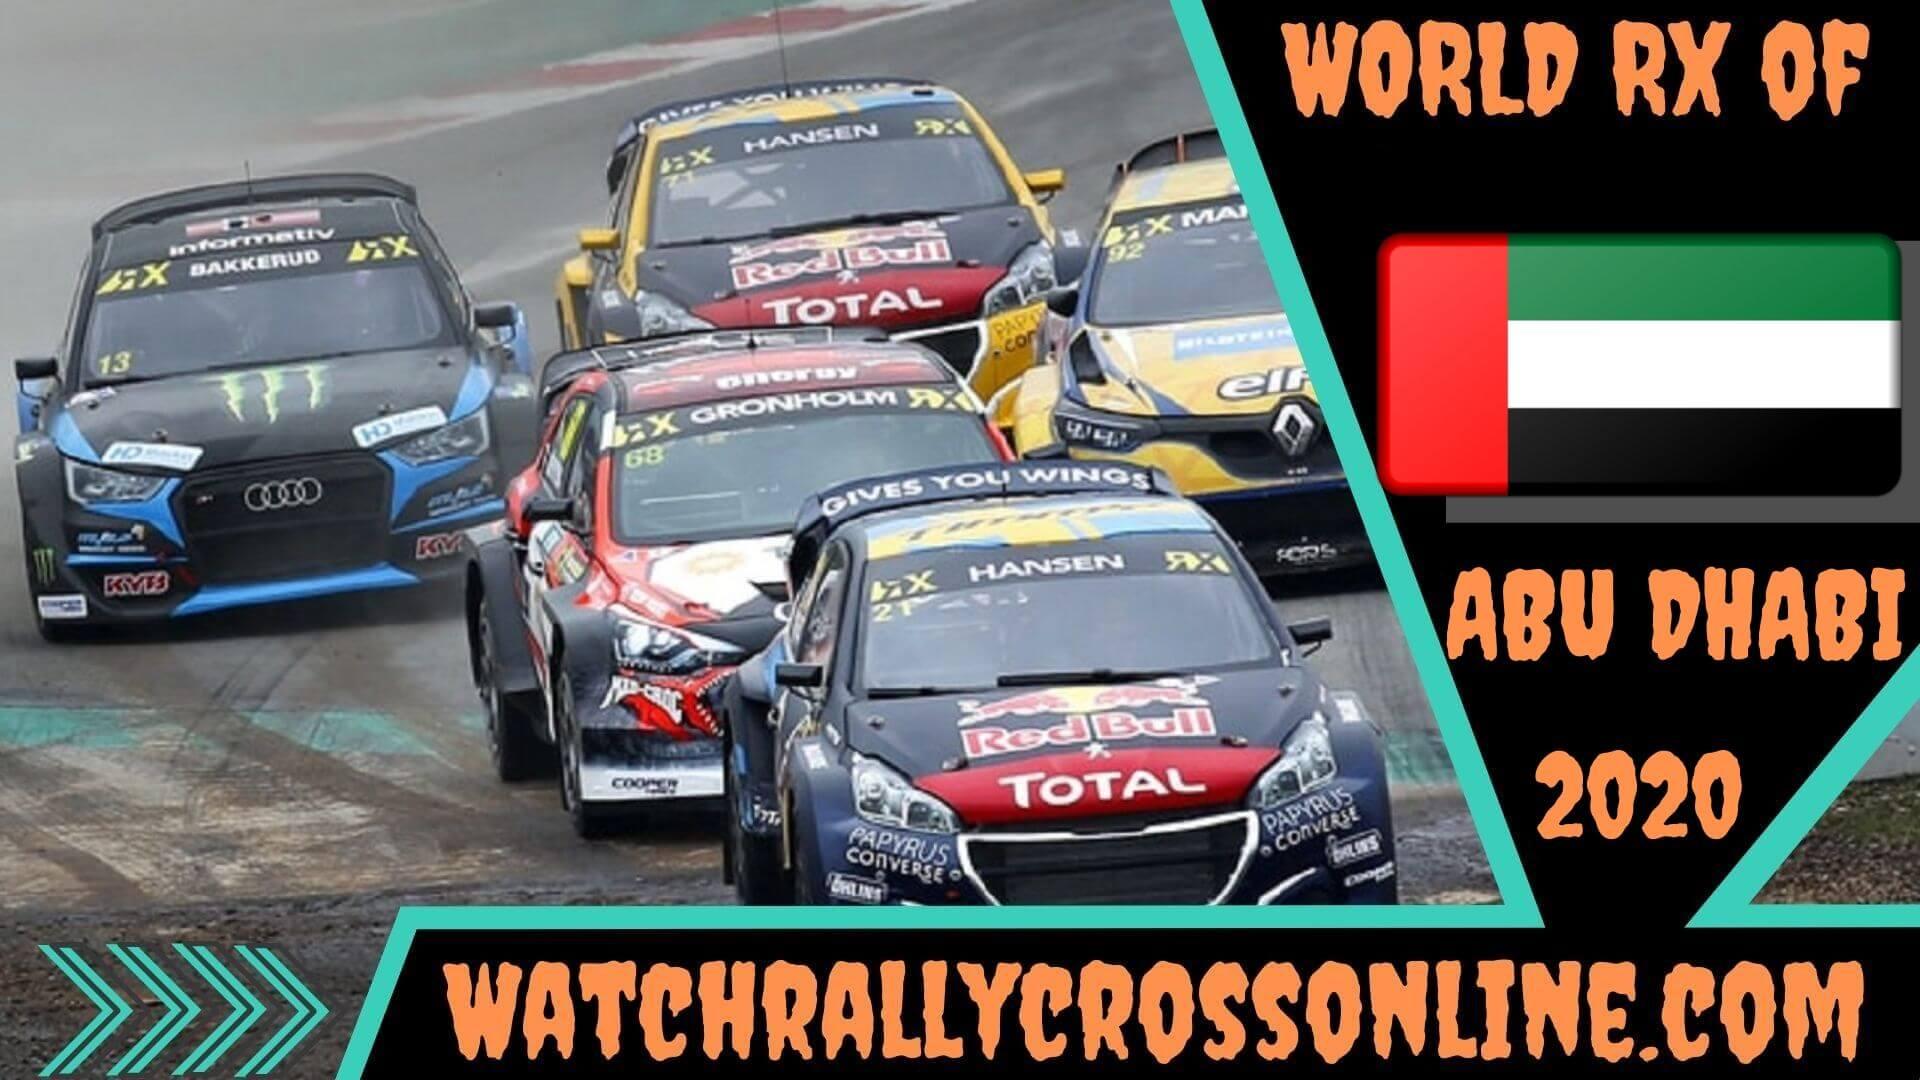 World Rallycross of Abu Dhabi Live Stream 2020 | Round 10